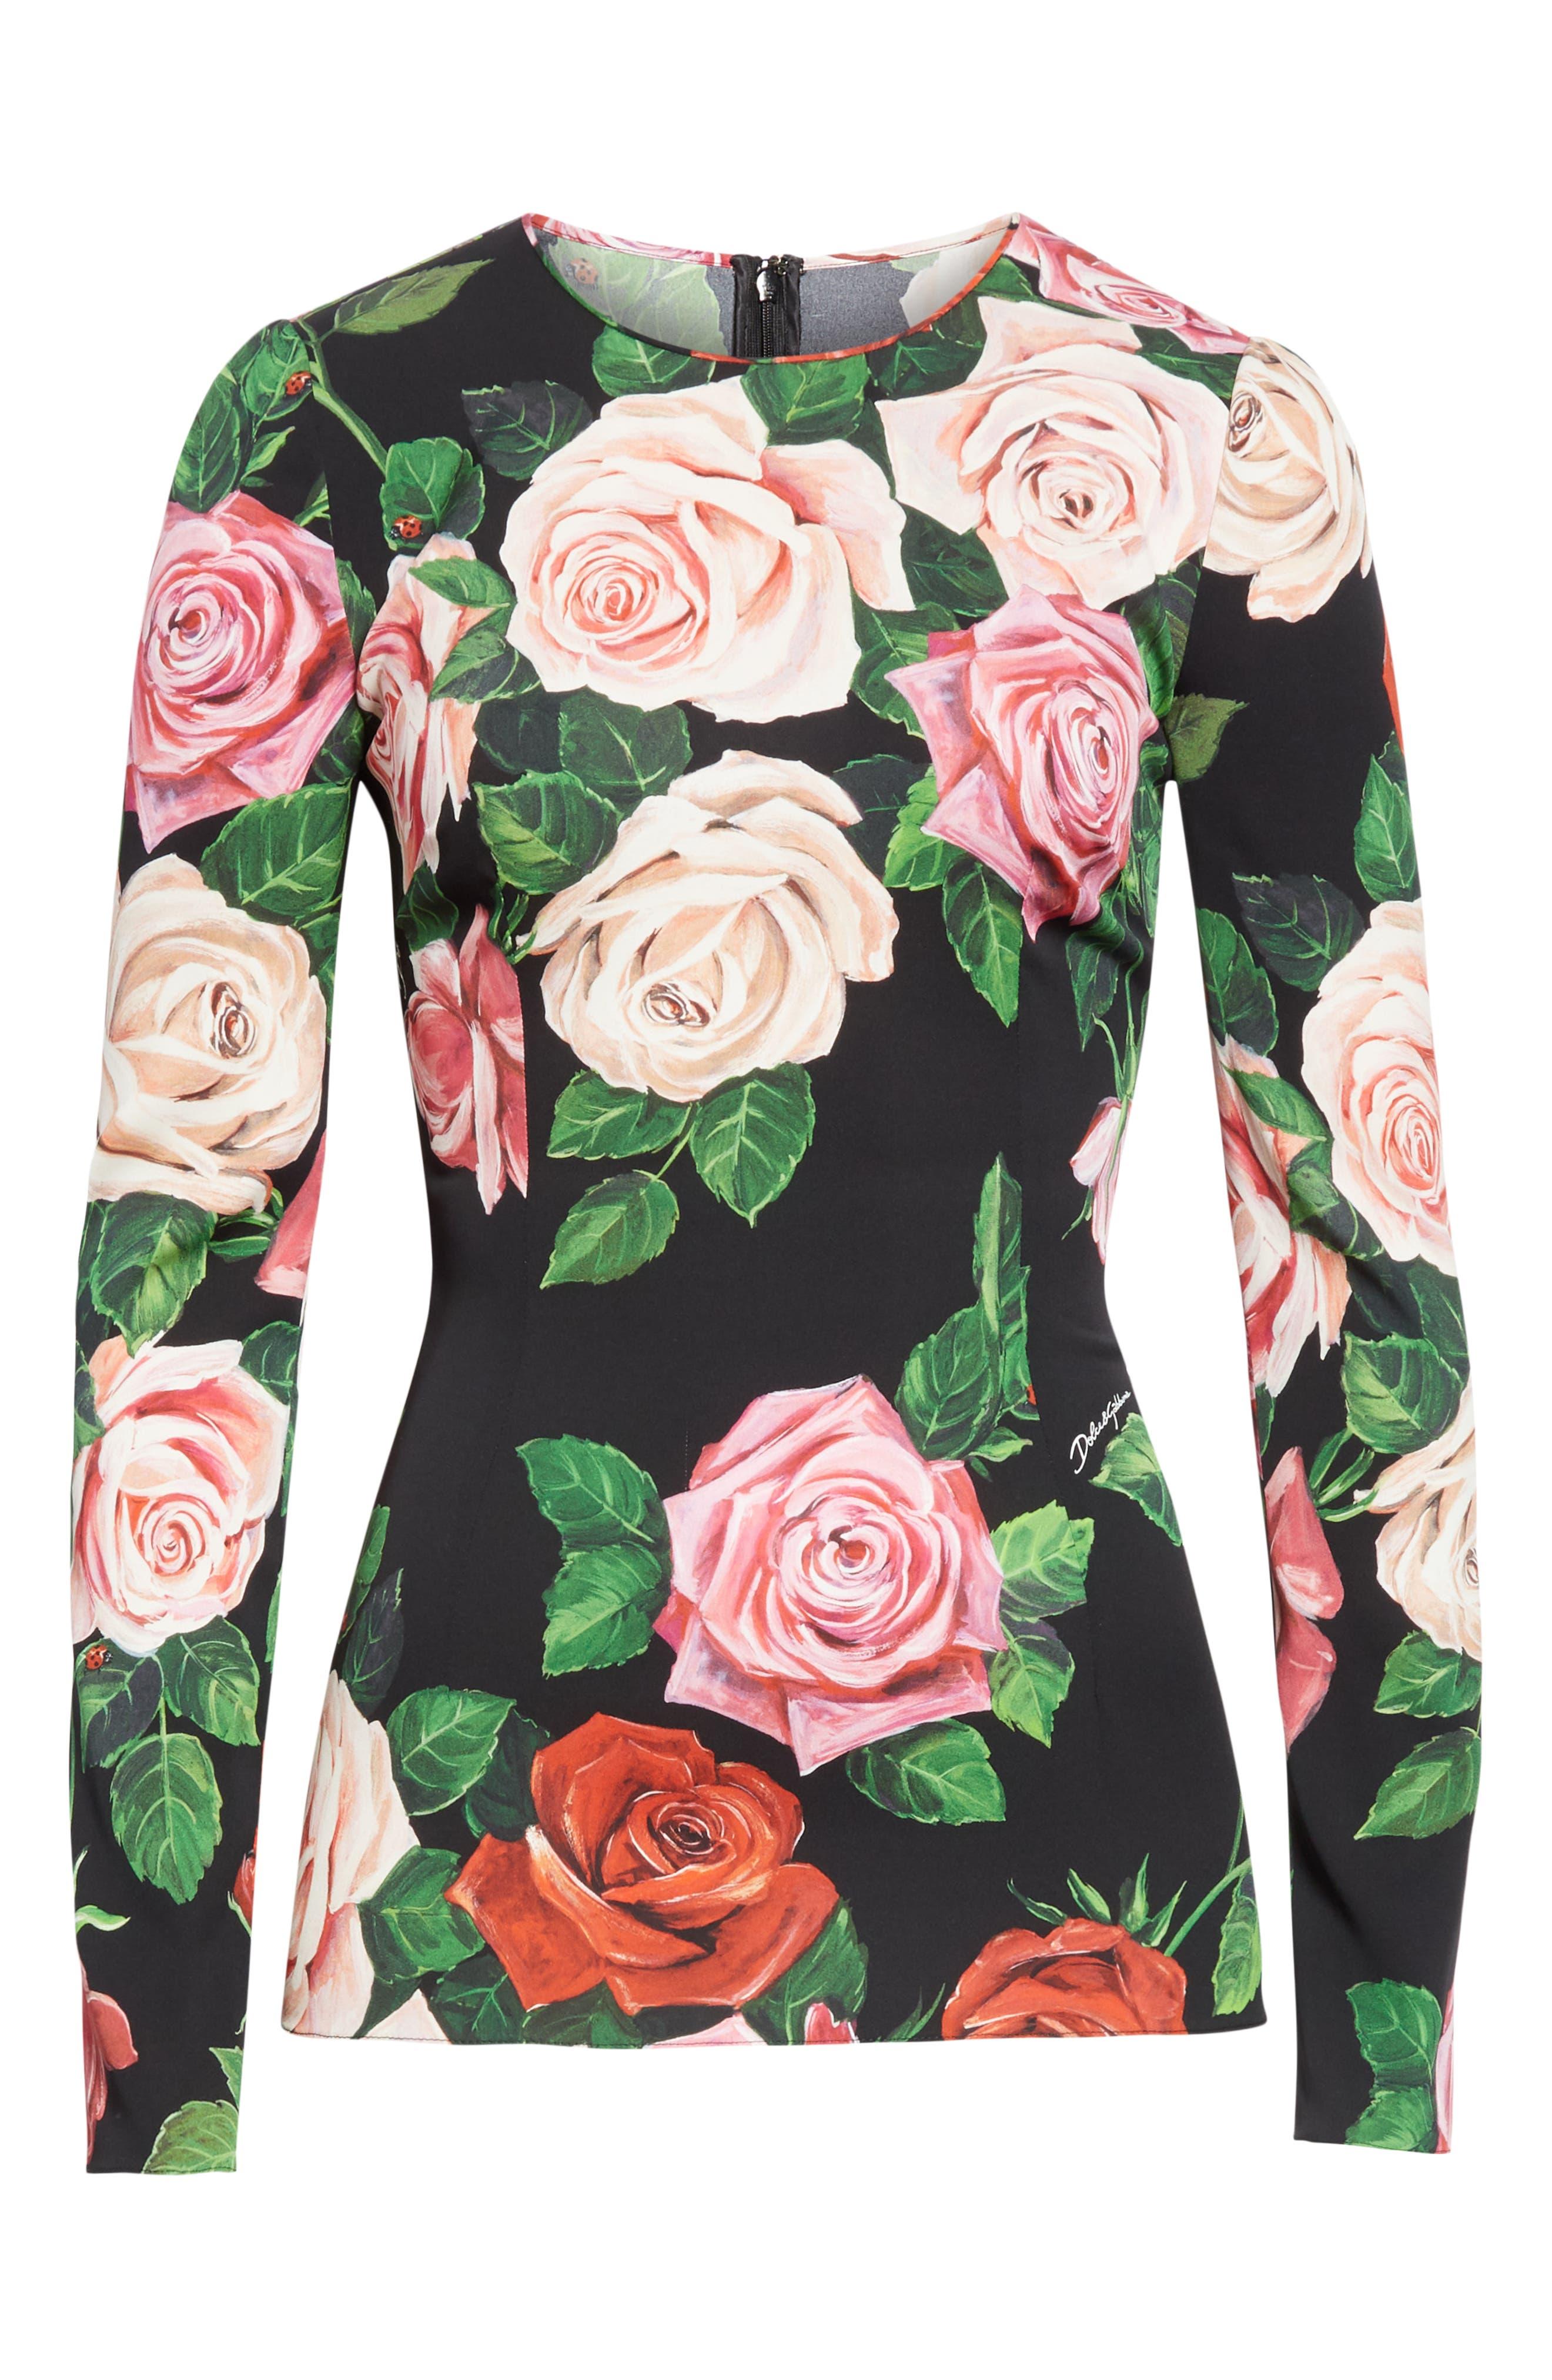 DOLCE&GABBANA, Rose Print Stretch Silk Top, Alternate thumbnail 6, color, BLACK ROSE